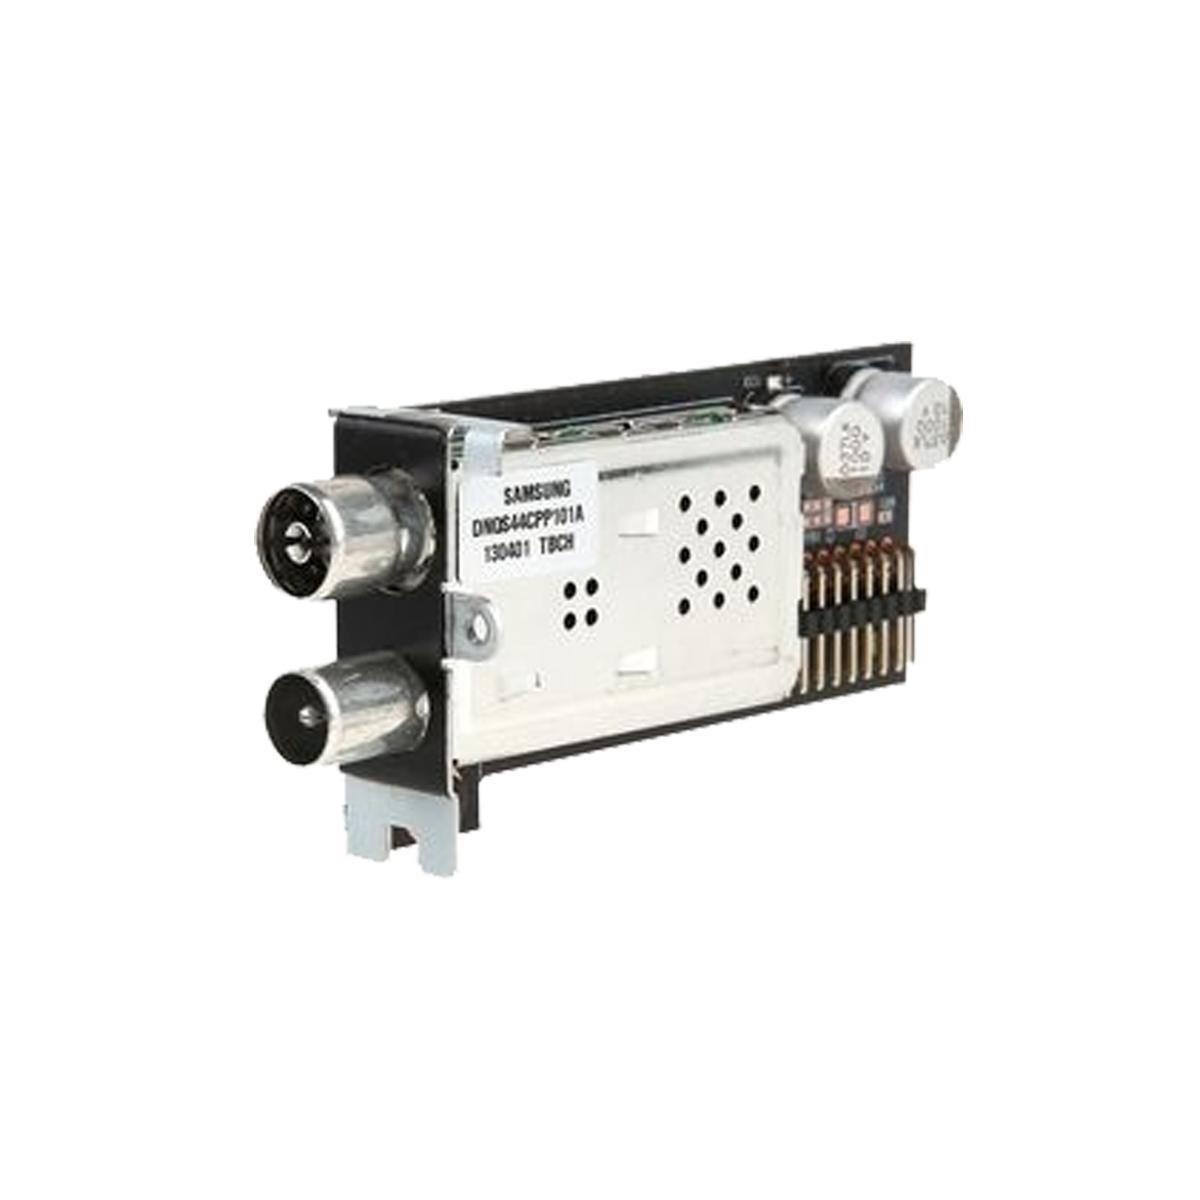 Xtrend DVB-C/T2 H.264 Hybrid Tuner ET 7500 / ET 8500 XTRZUB003